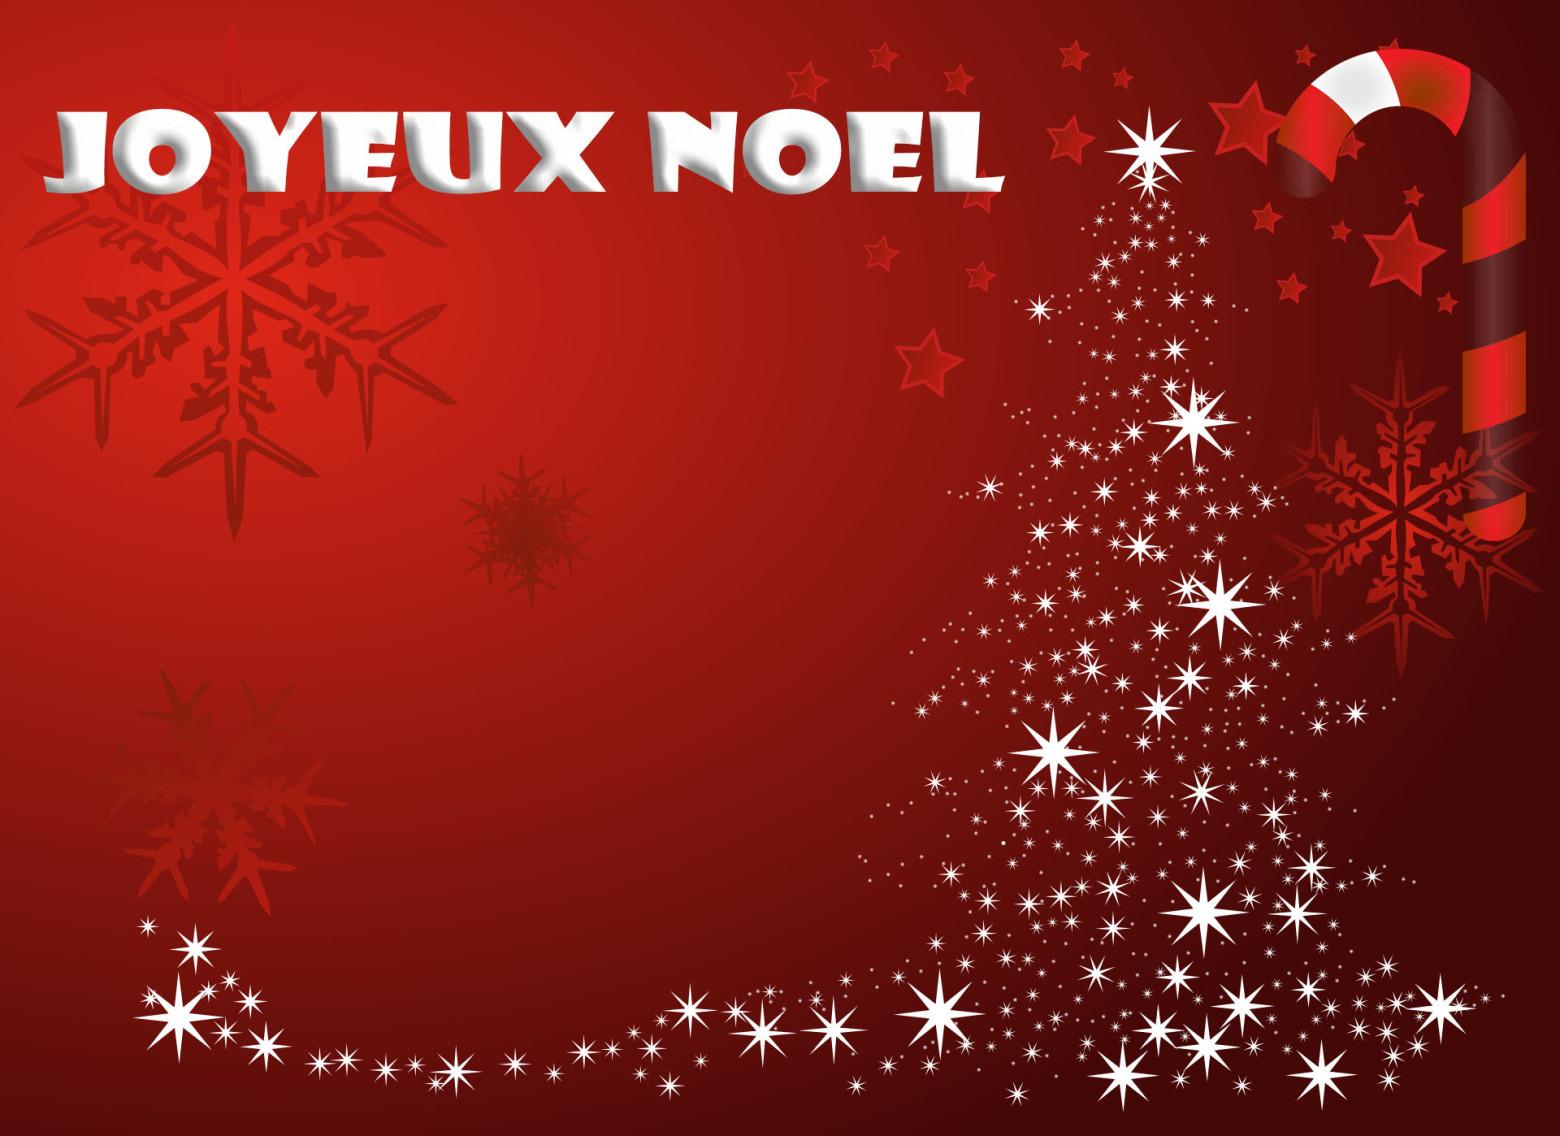 Joyeux Noel Images Gratuites.Joyeux Noel Carte De Voeux Gratuites Images Gratuites Et